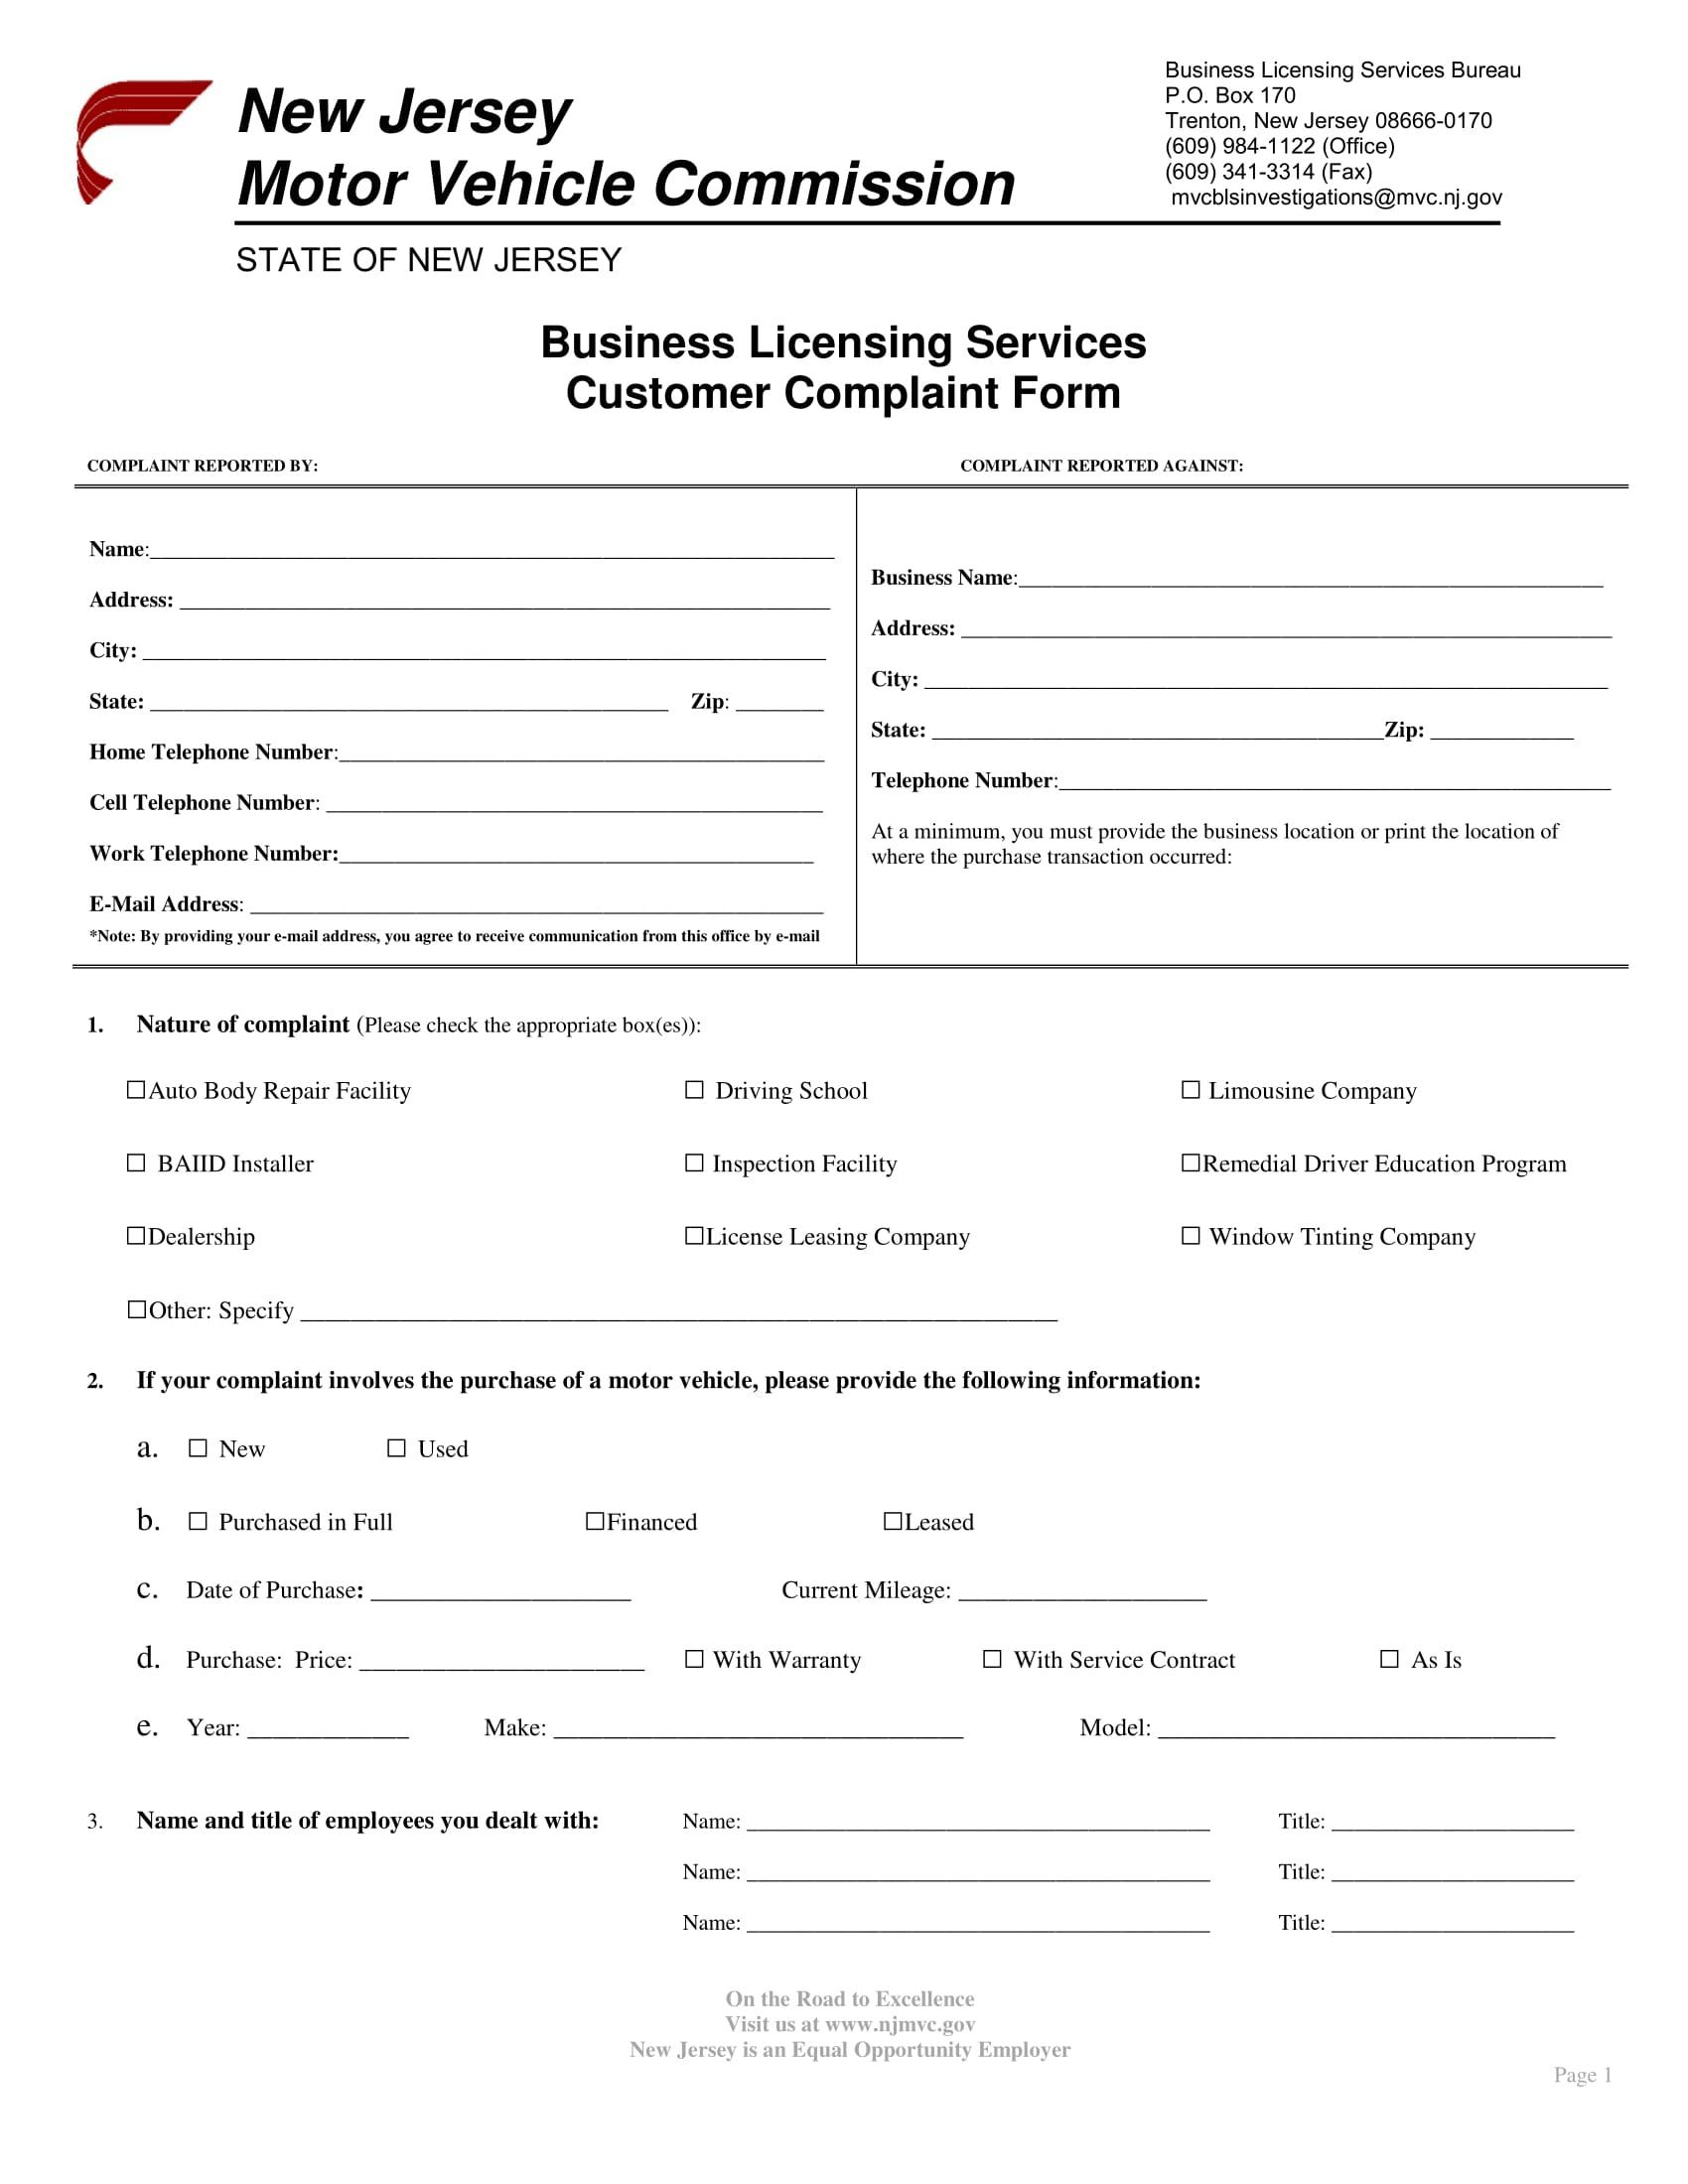 licensing service customer complaint form 1